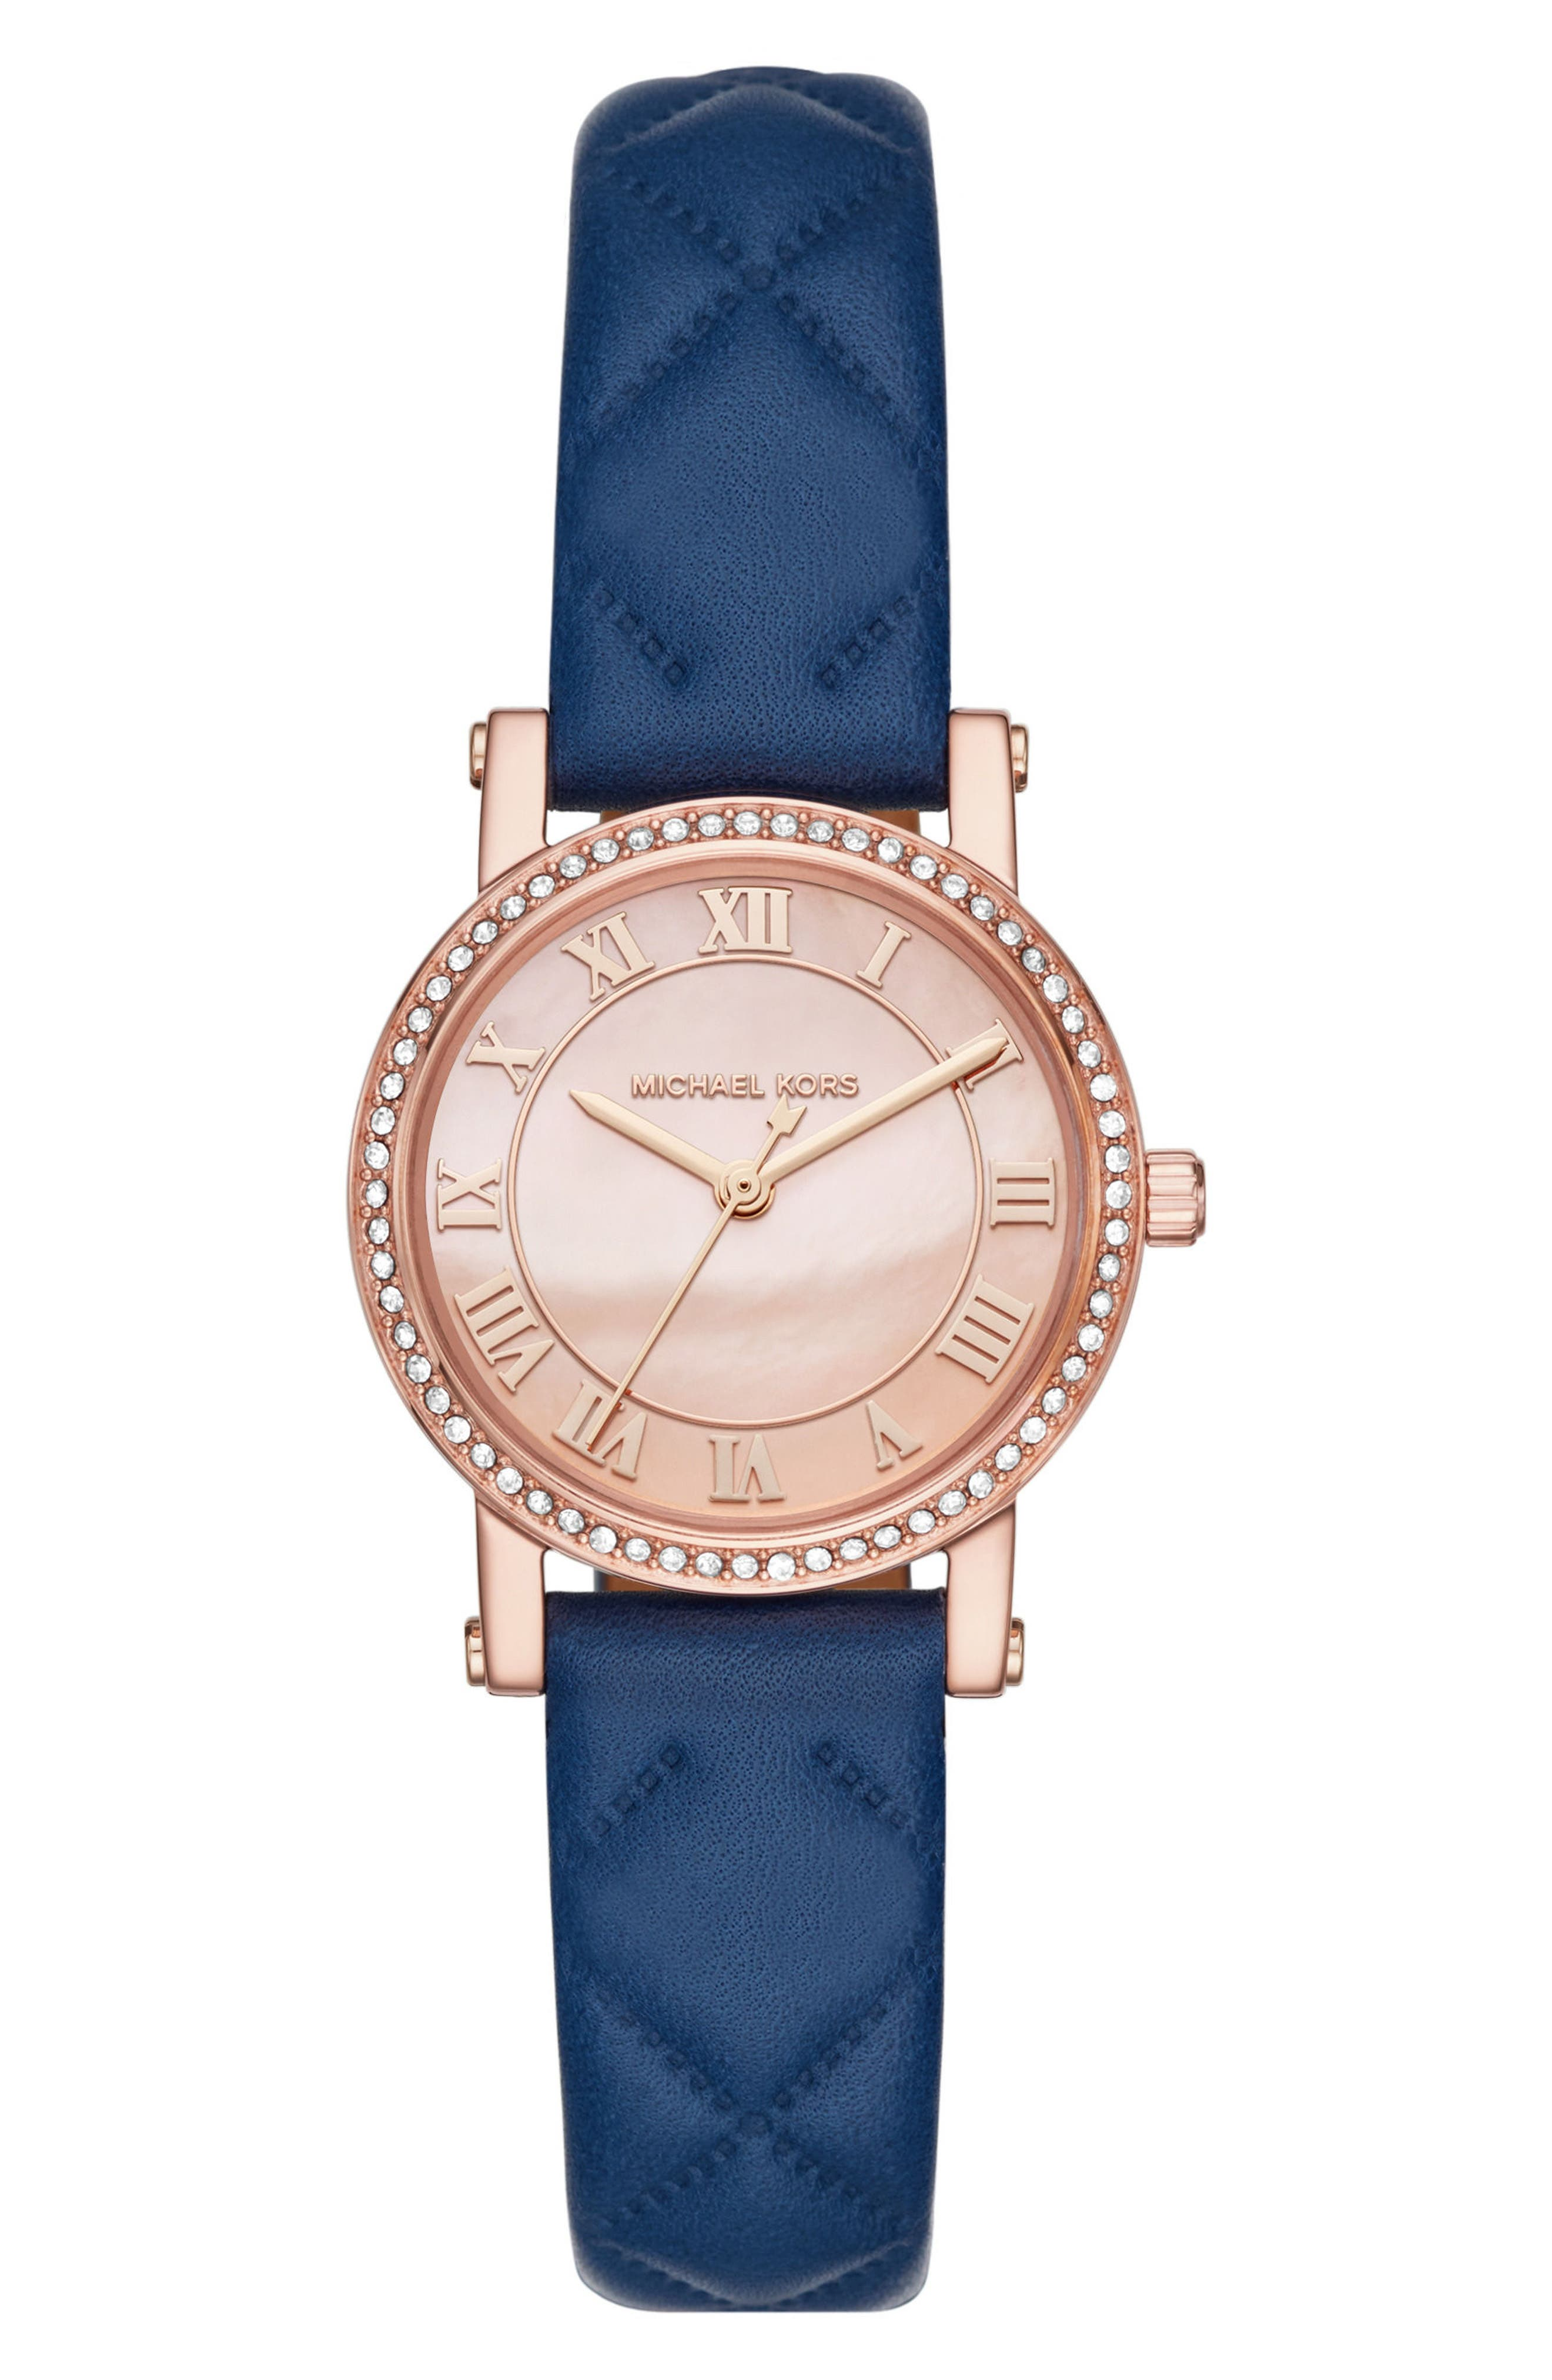 Alternate Image 1 Selected - Michael Kors Petite Norie Pavé Leather Strap Watch, 28mm